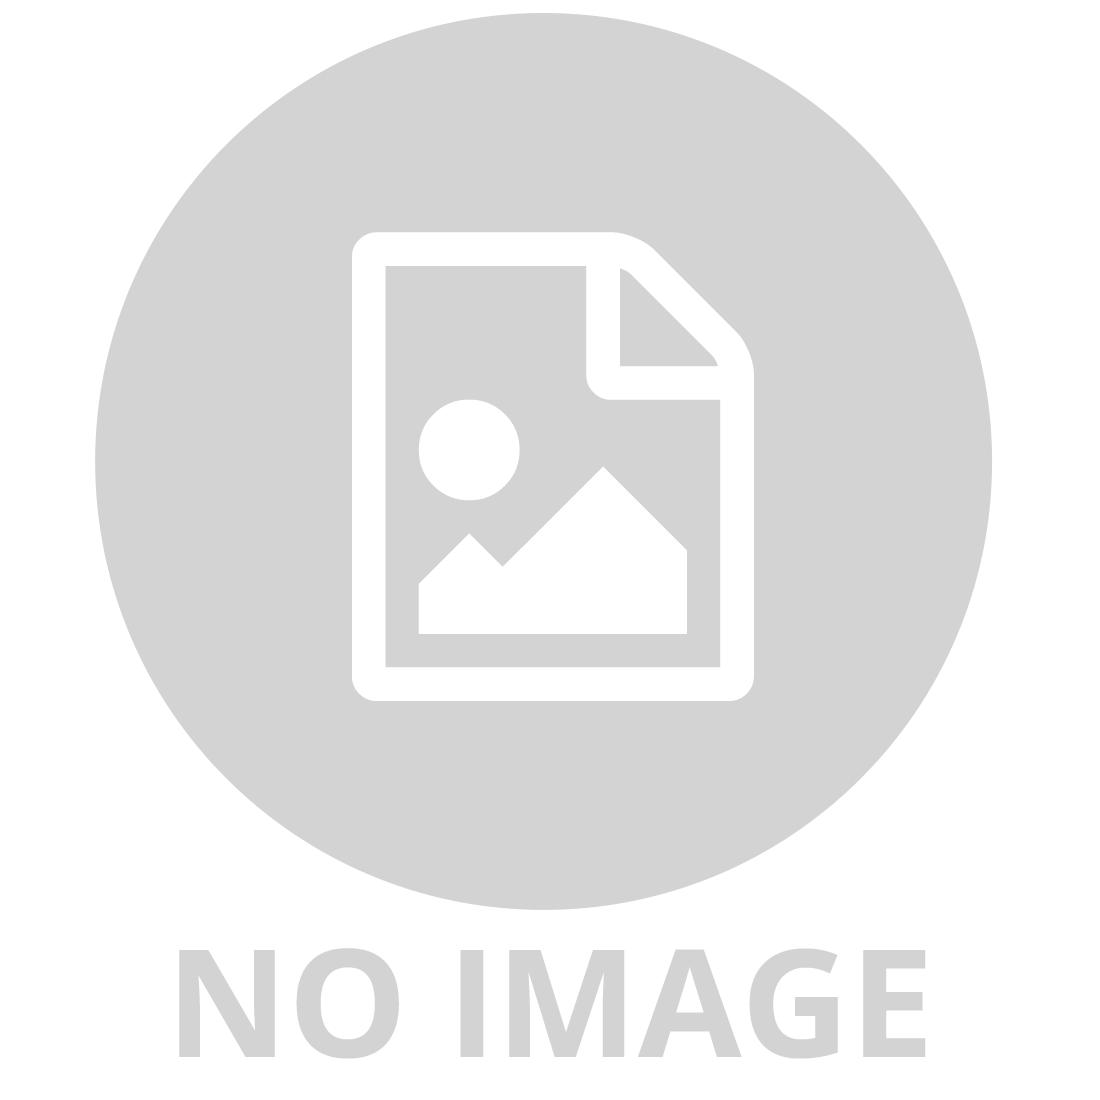 RAVENSBURGER- VW KOMBI BUS 3D PUZZLE